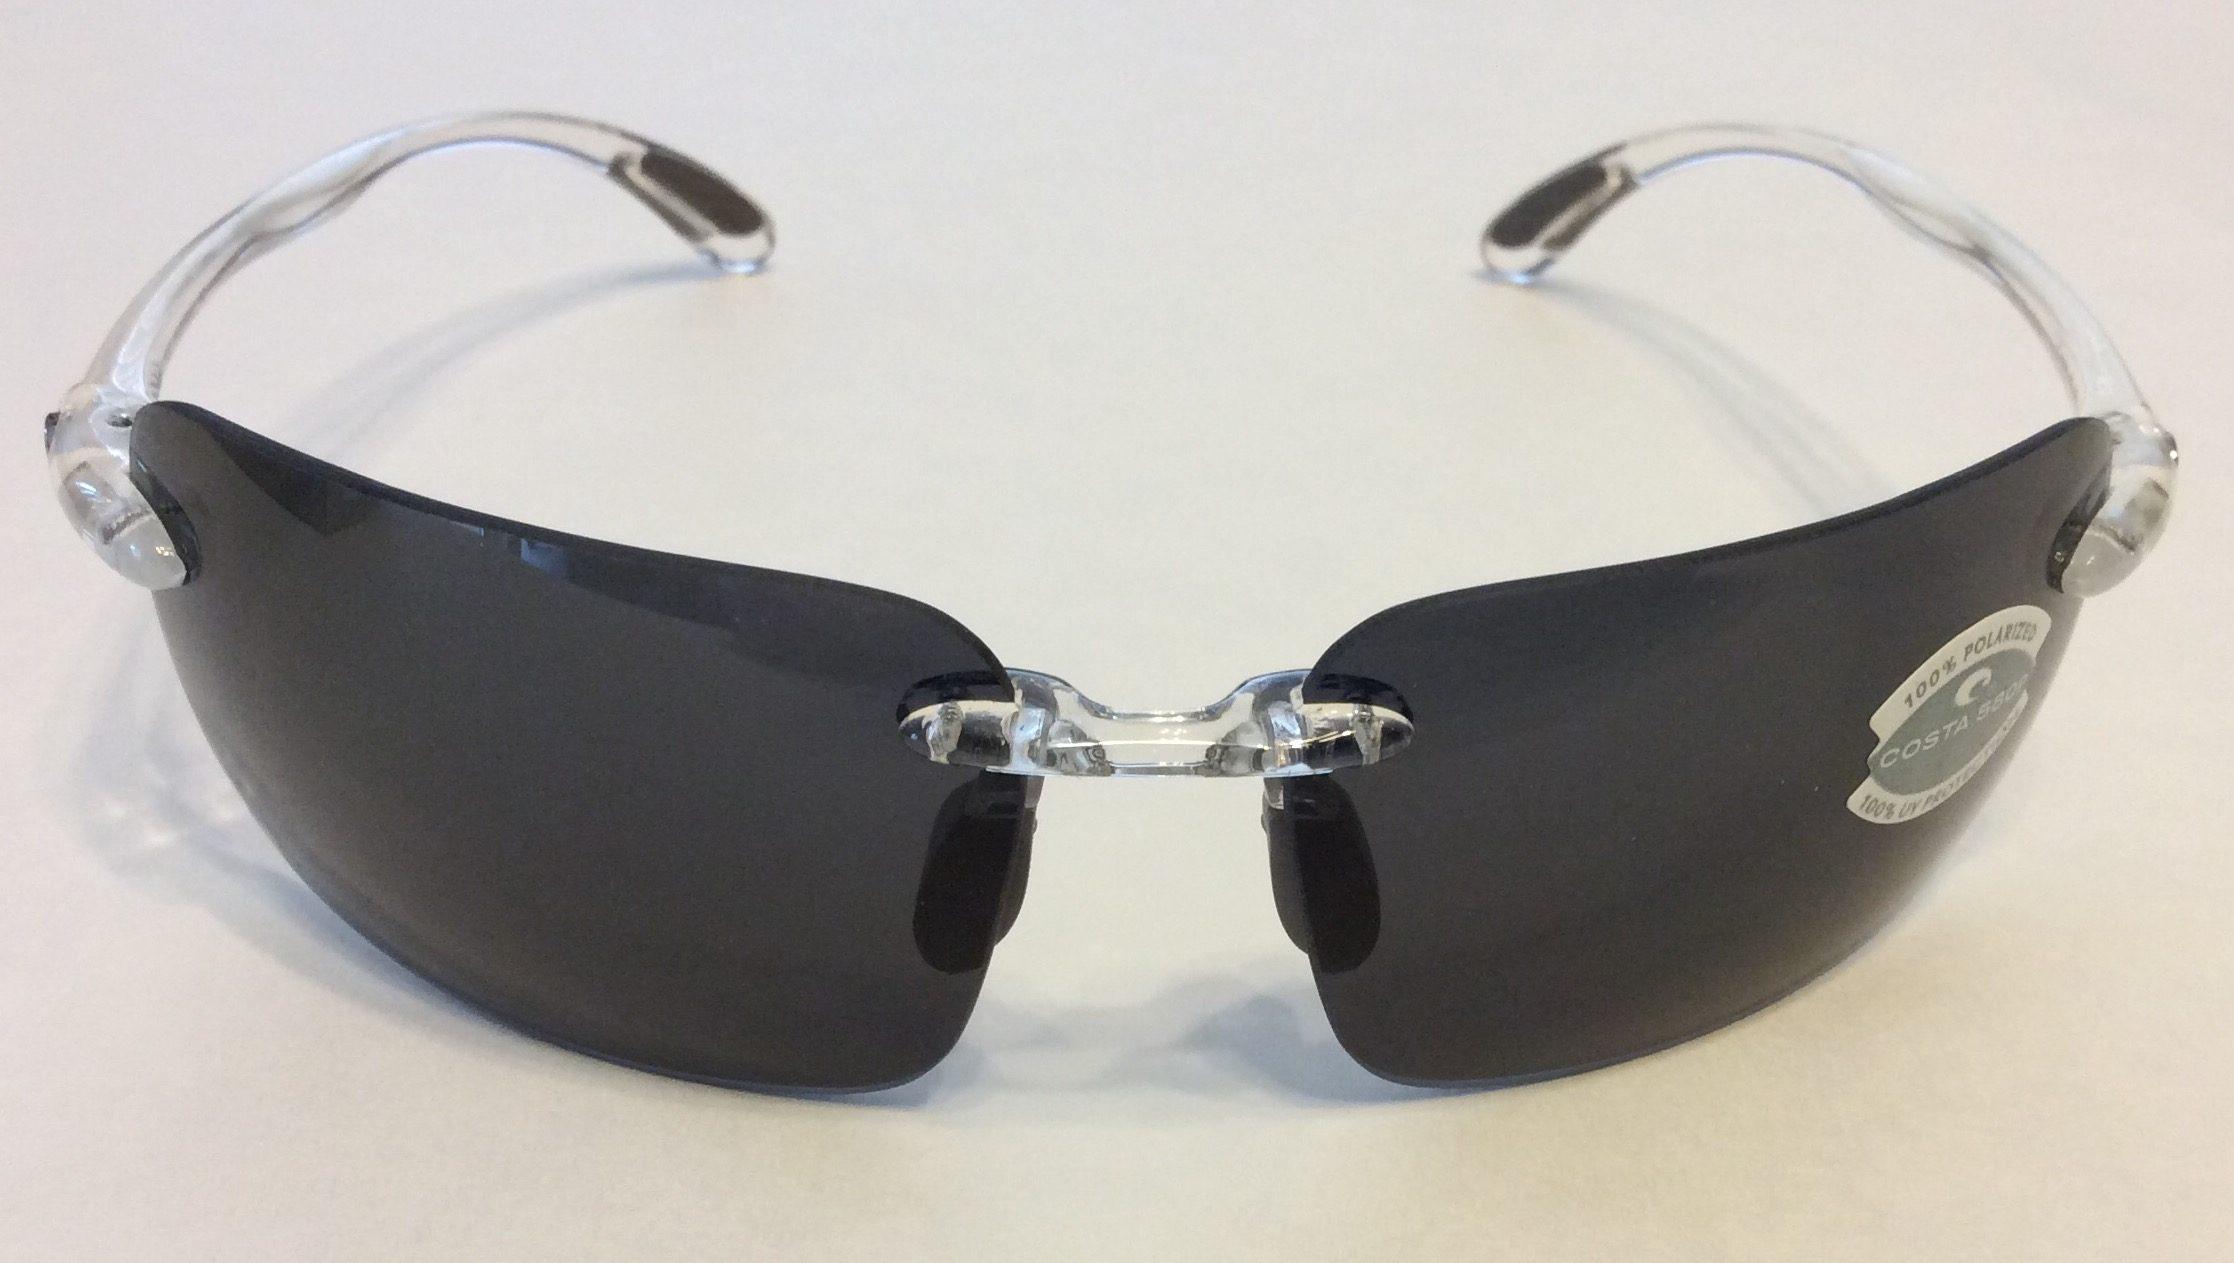 ba9ce966dd Costa Del Mar Cayan Sunglasses – Crystal Clear Frame – Polarized ...